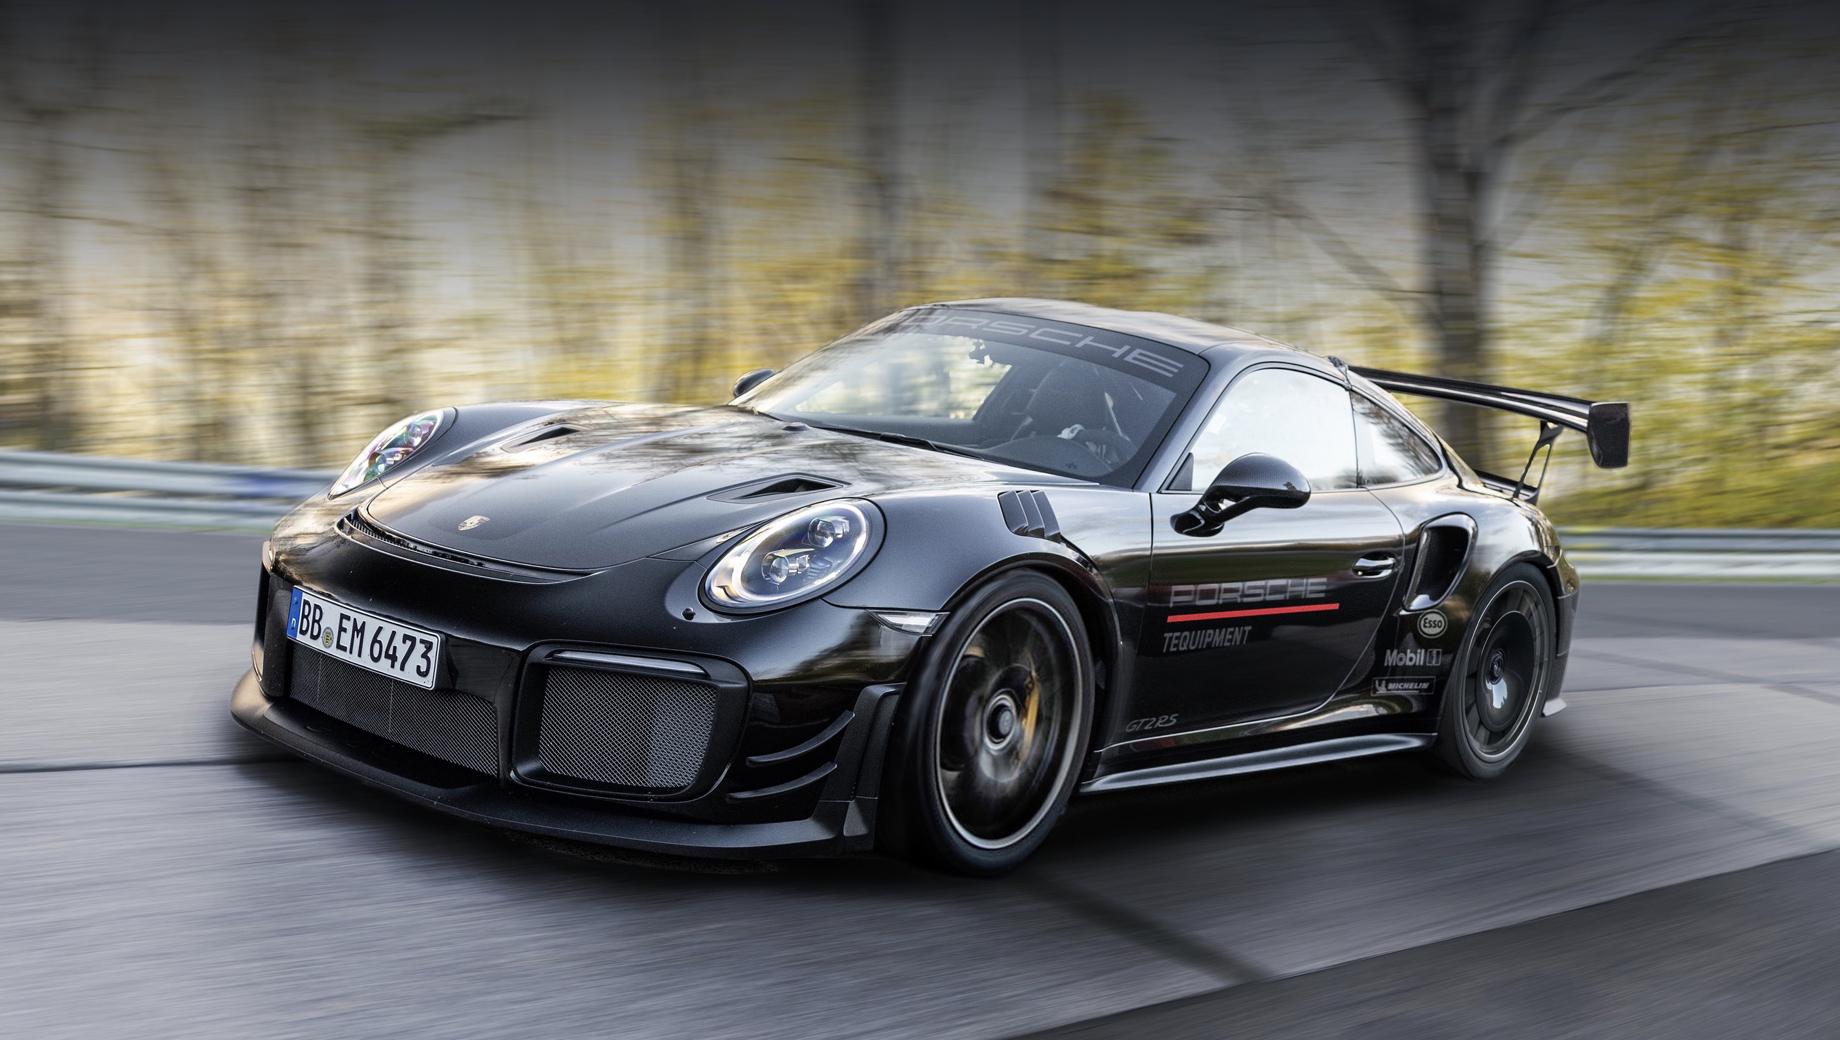 Porsche 911 GT2 RS побил рекорд с официальным пакетом